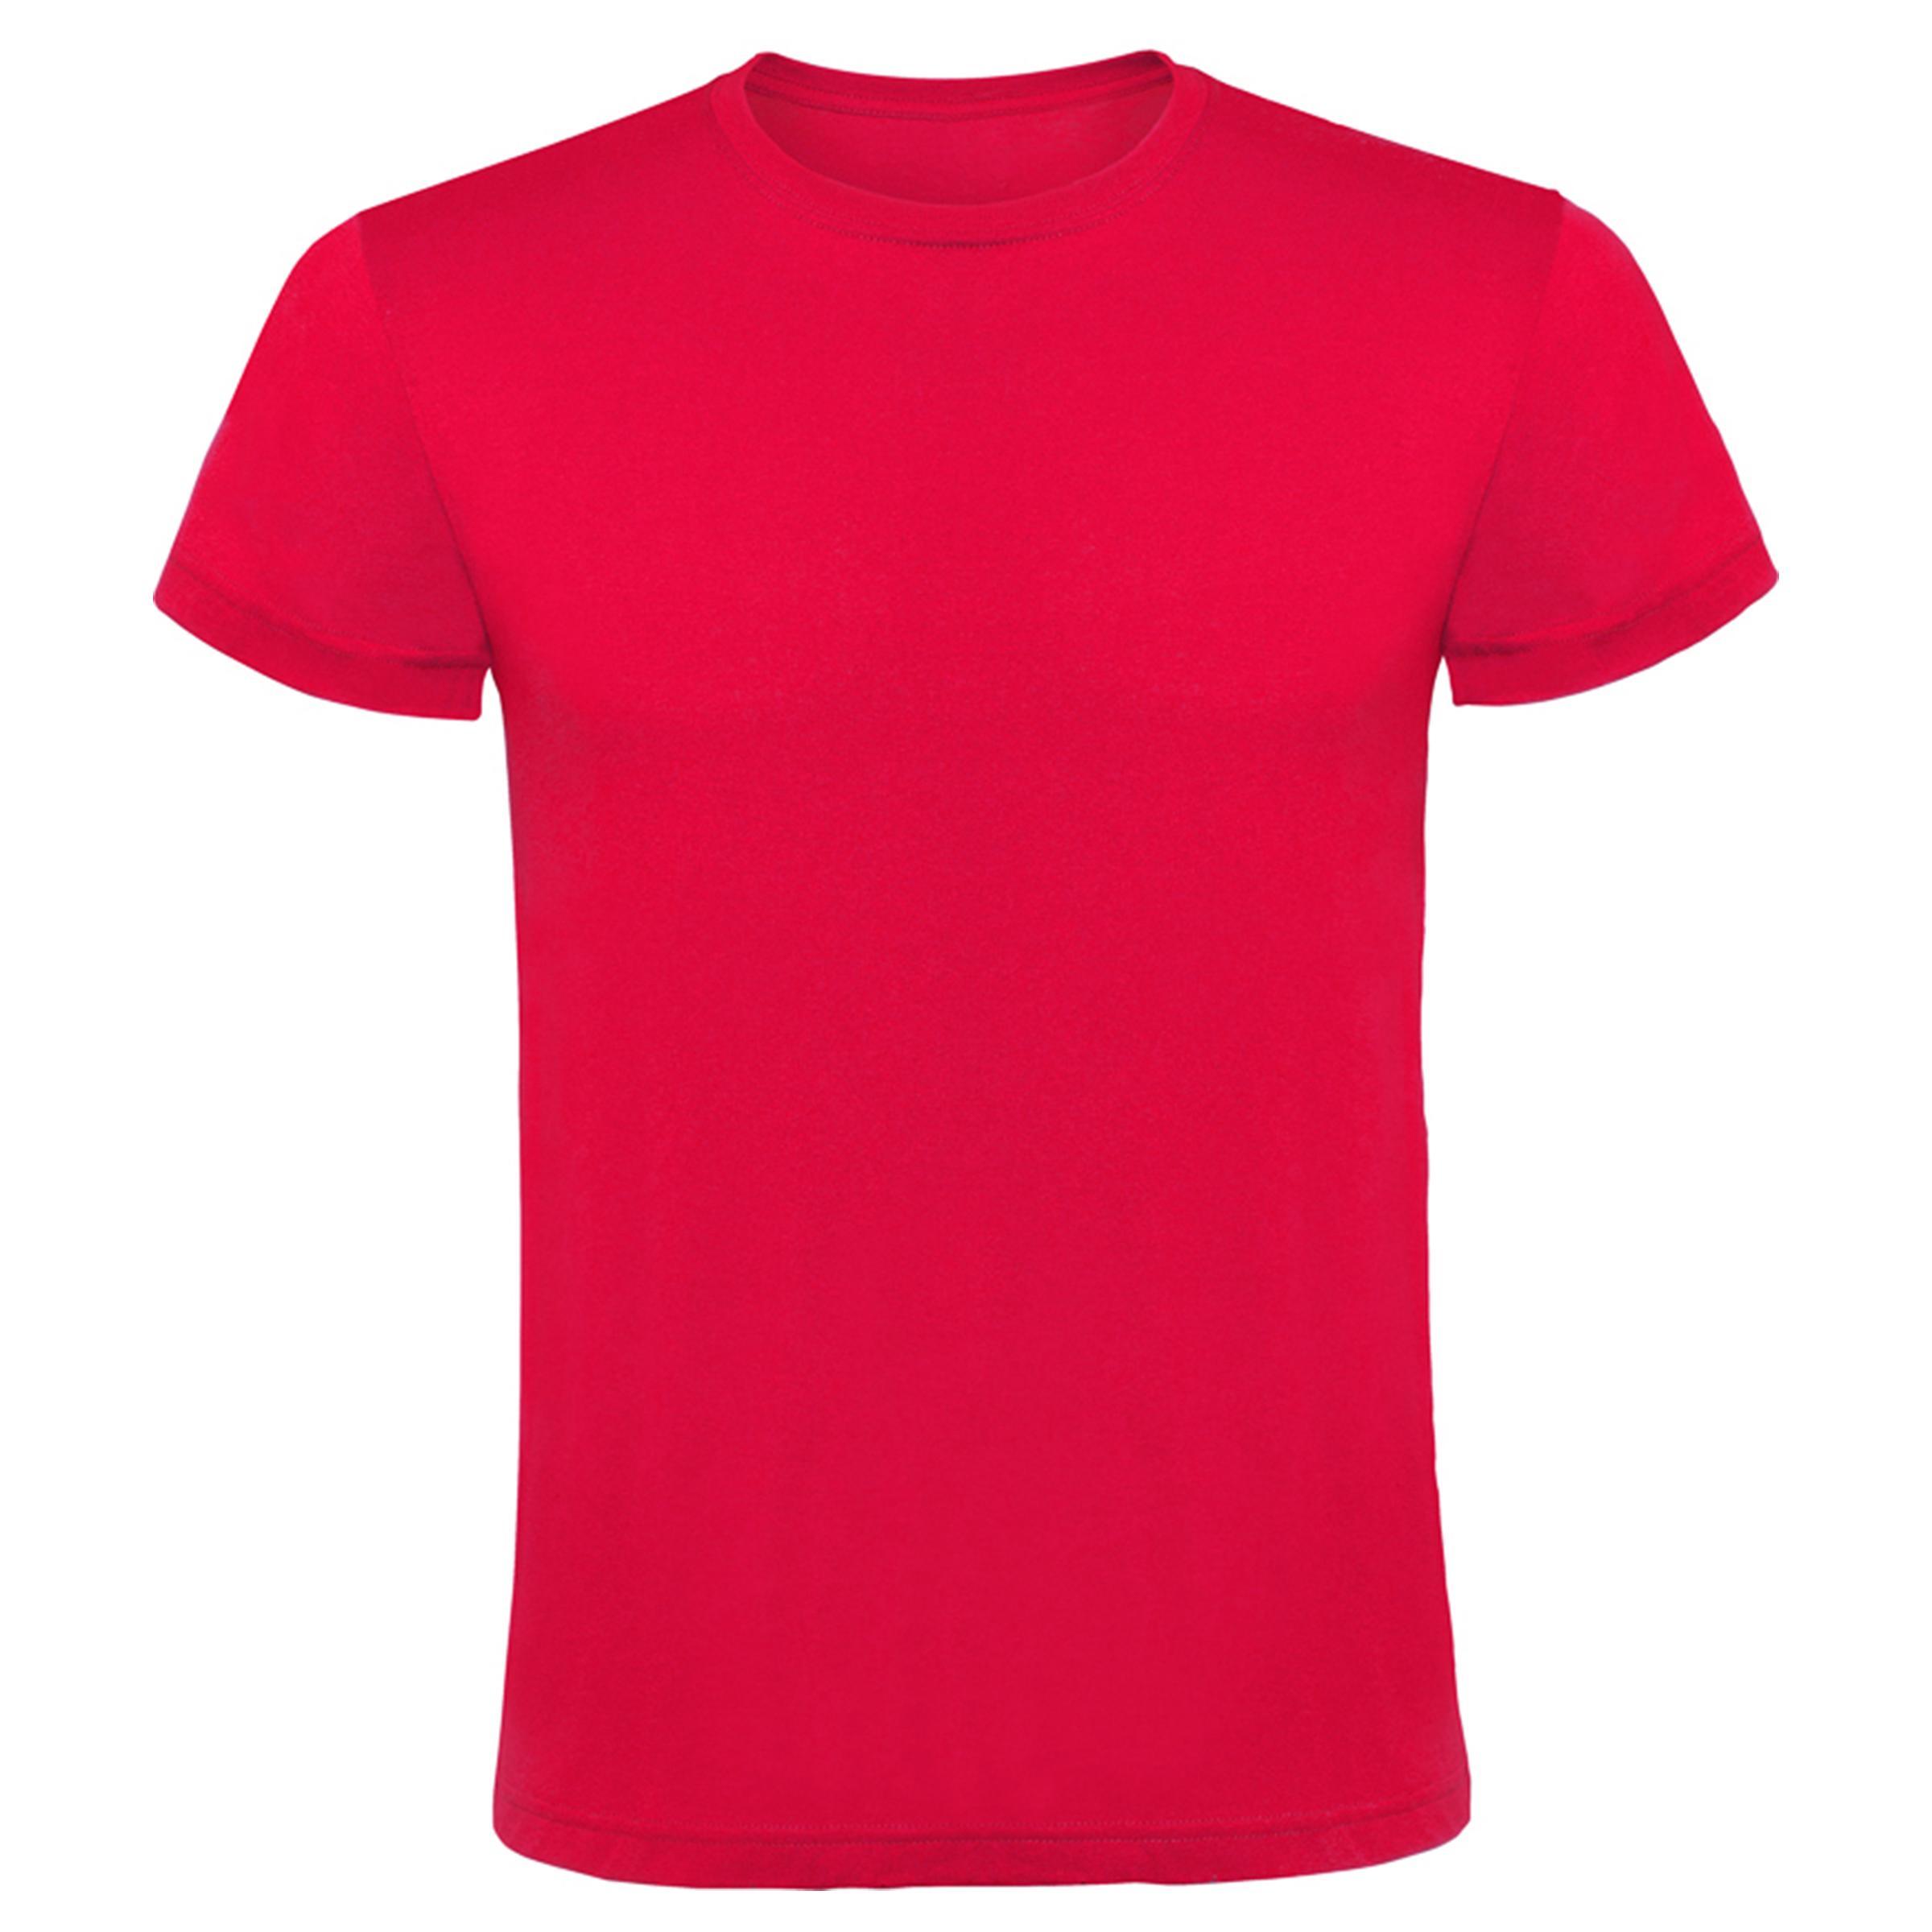 Unisex T Shirt 145gsm